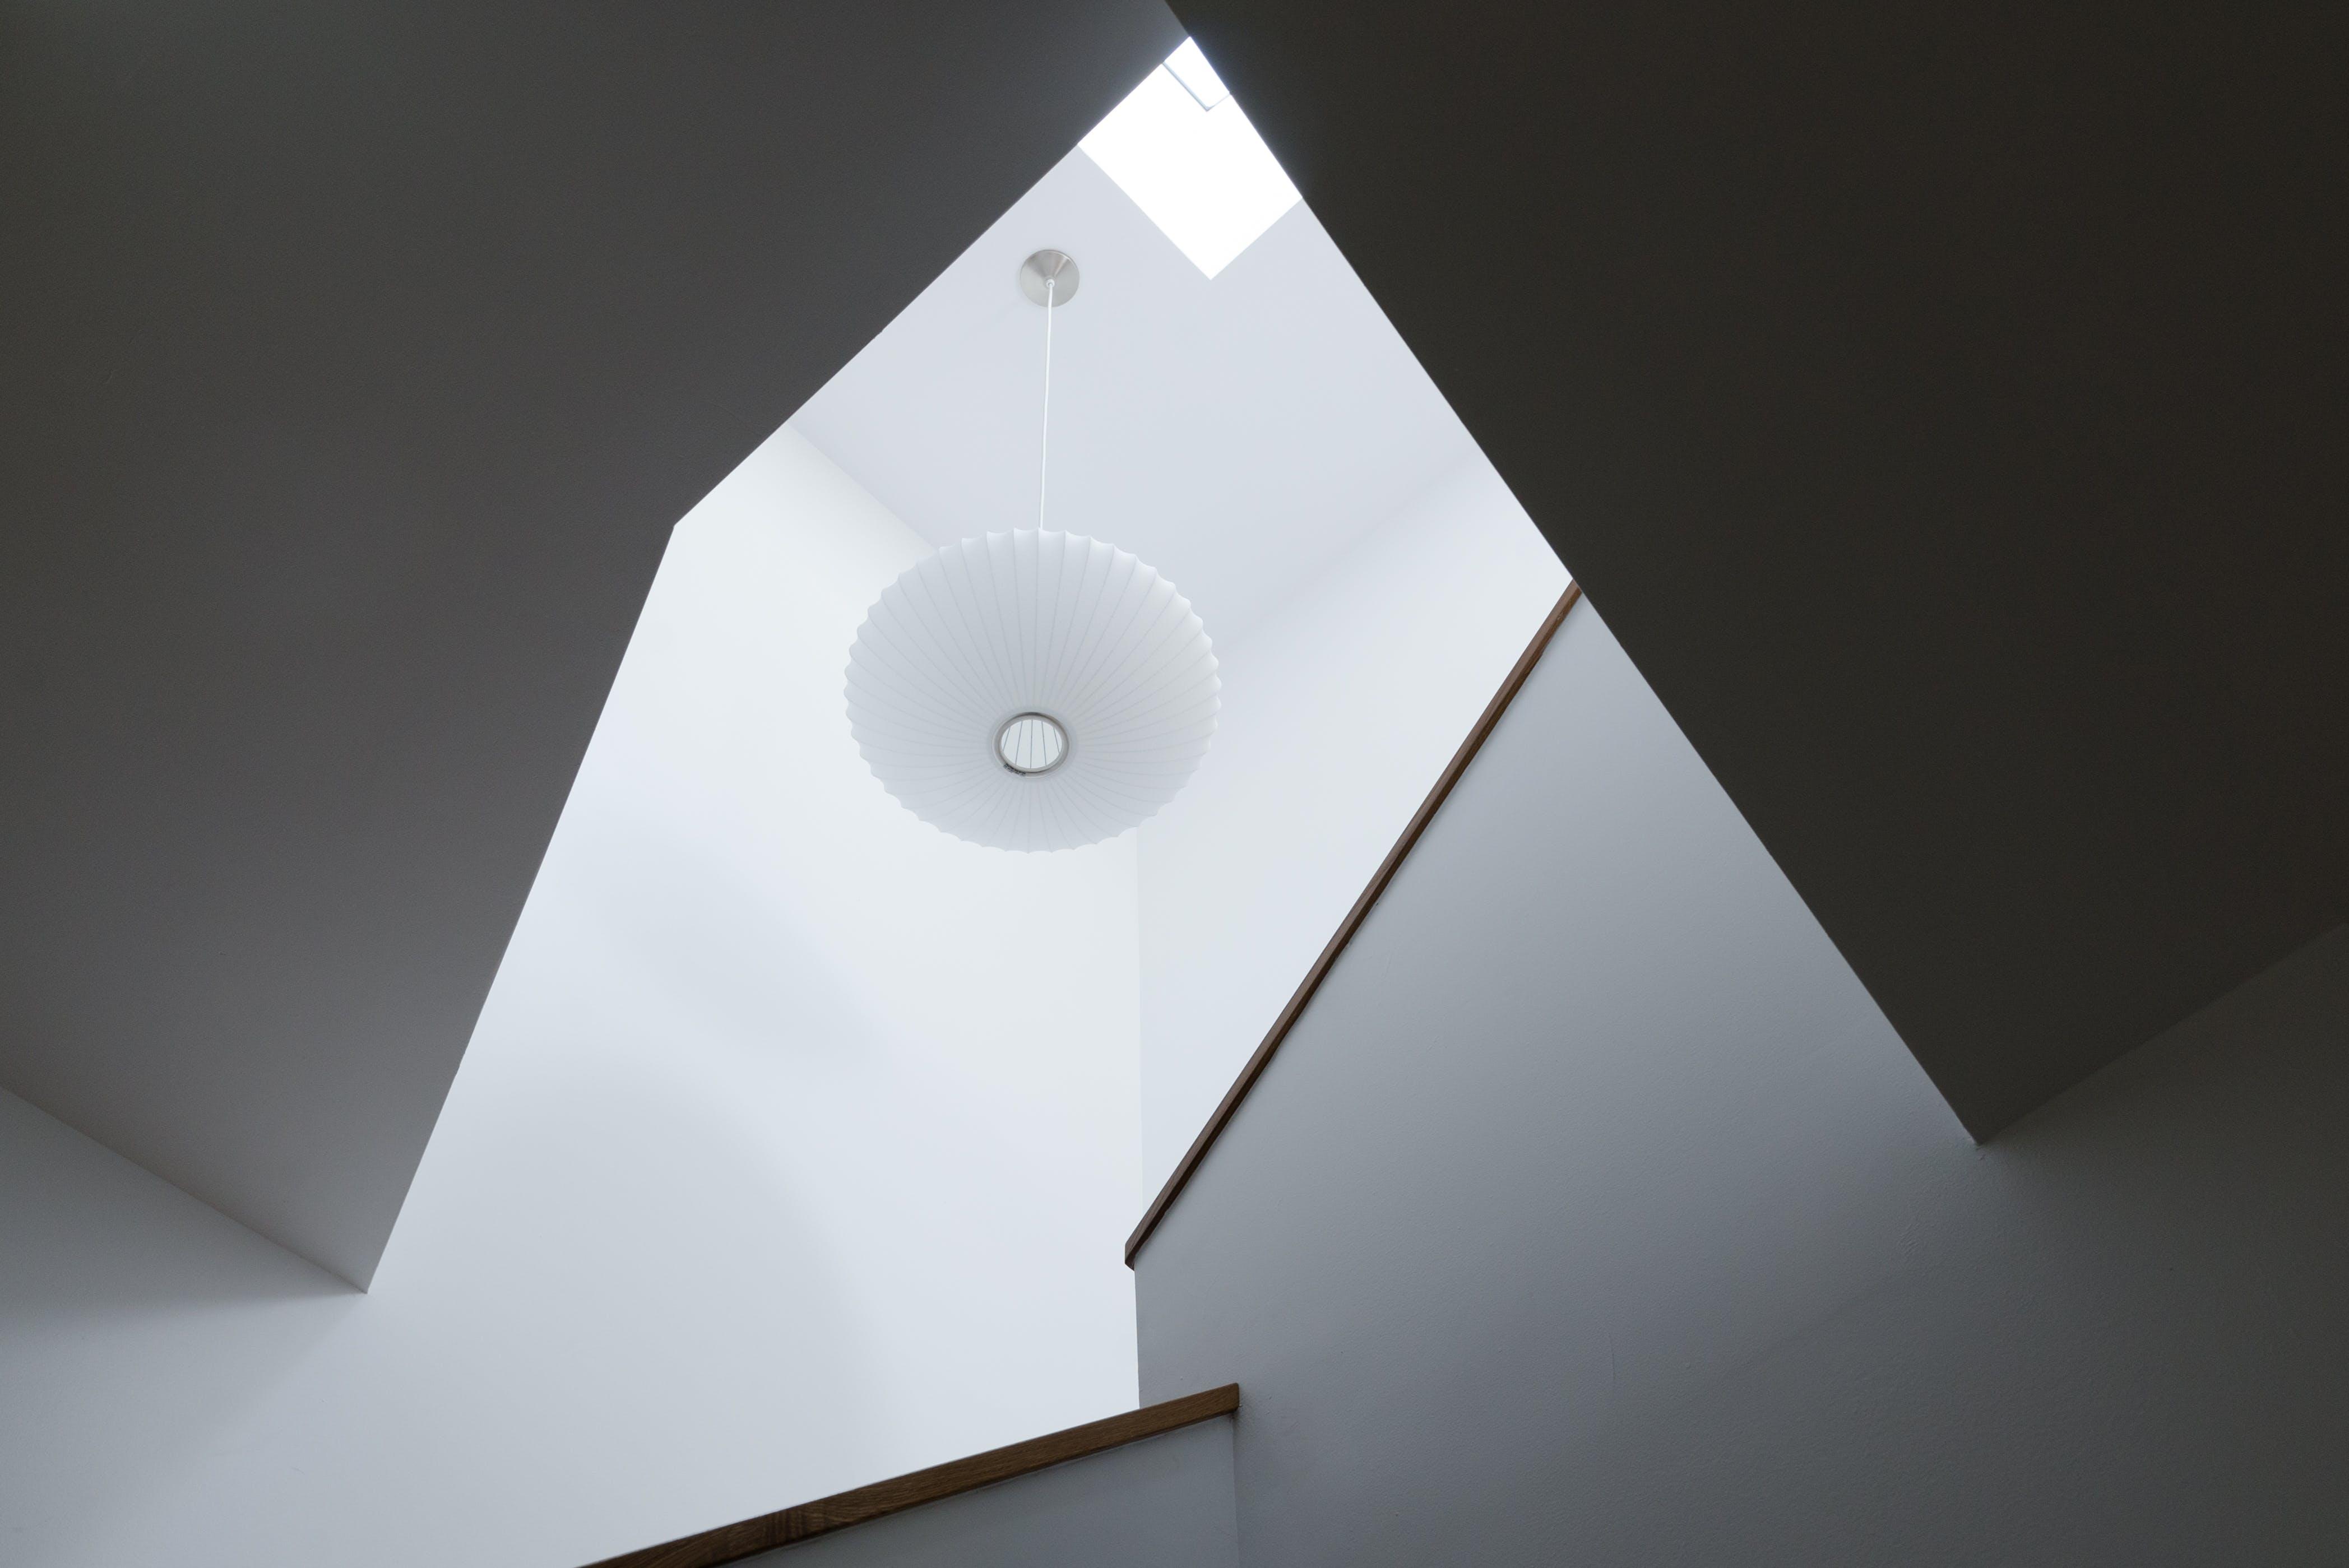 Turned-on White Pendant Lamp